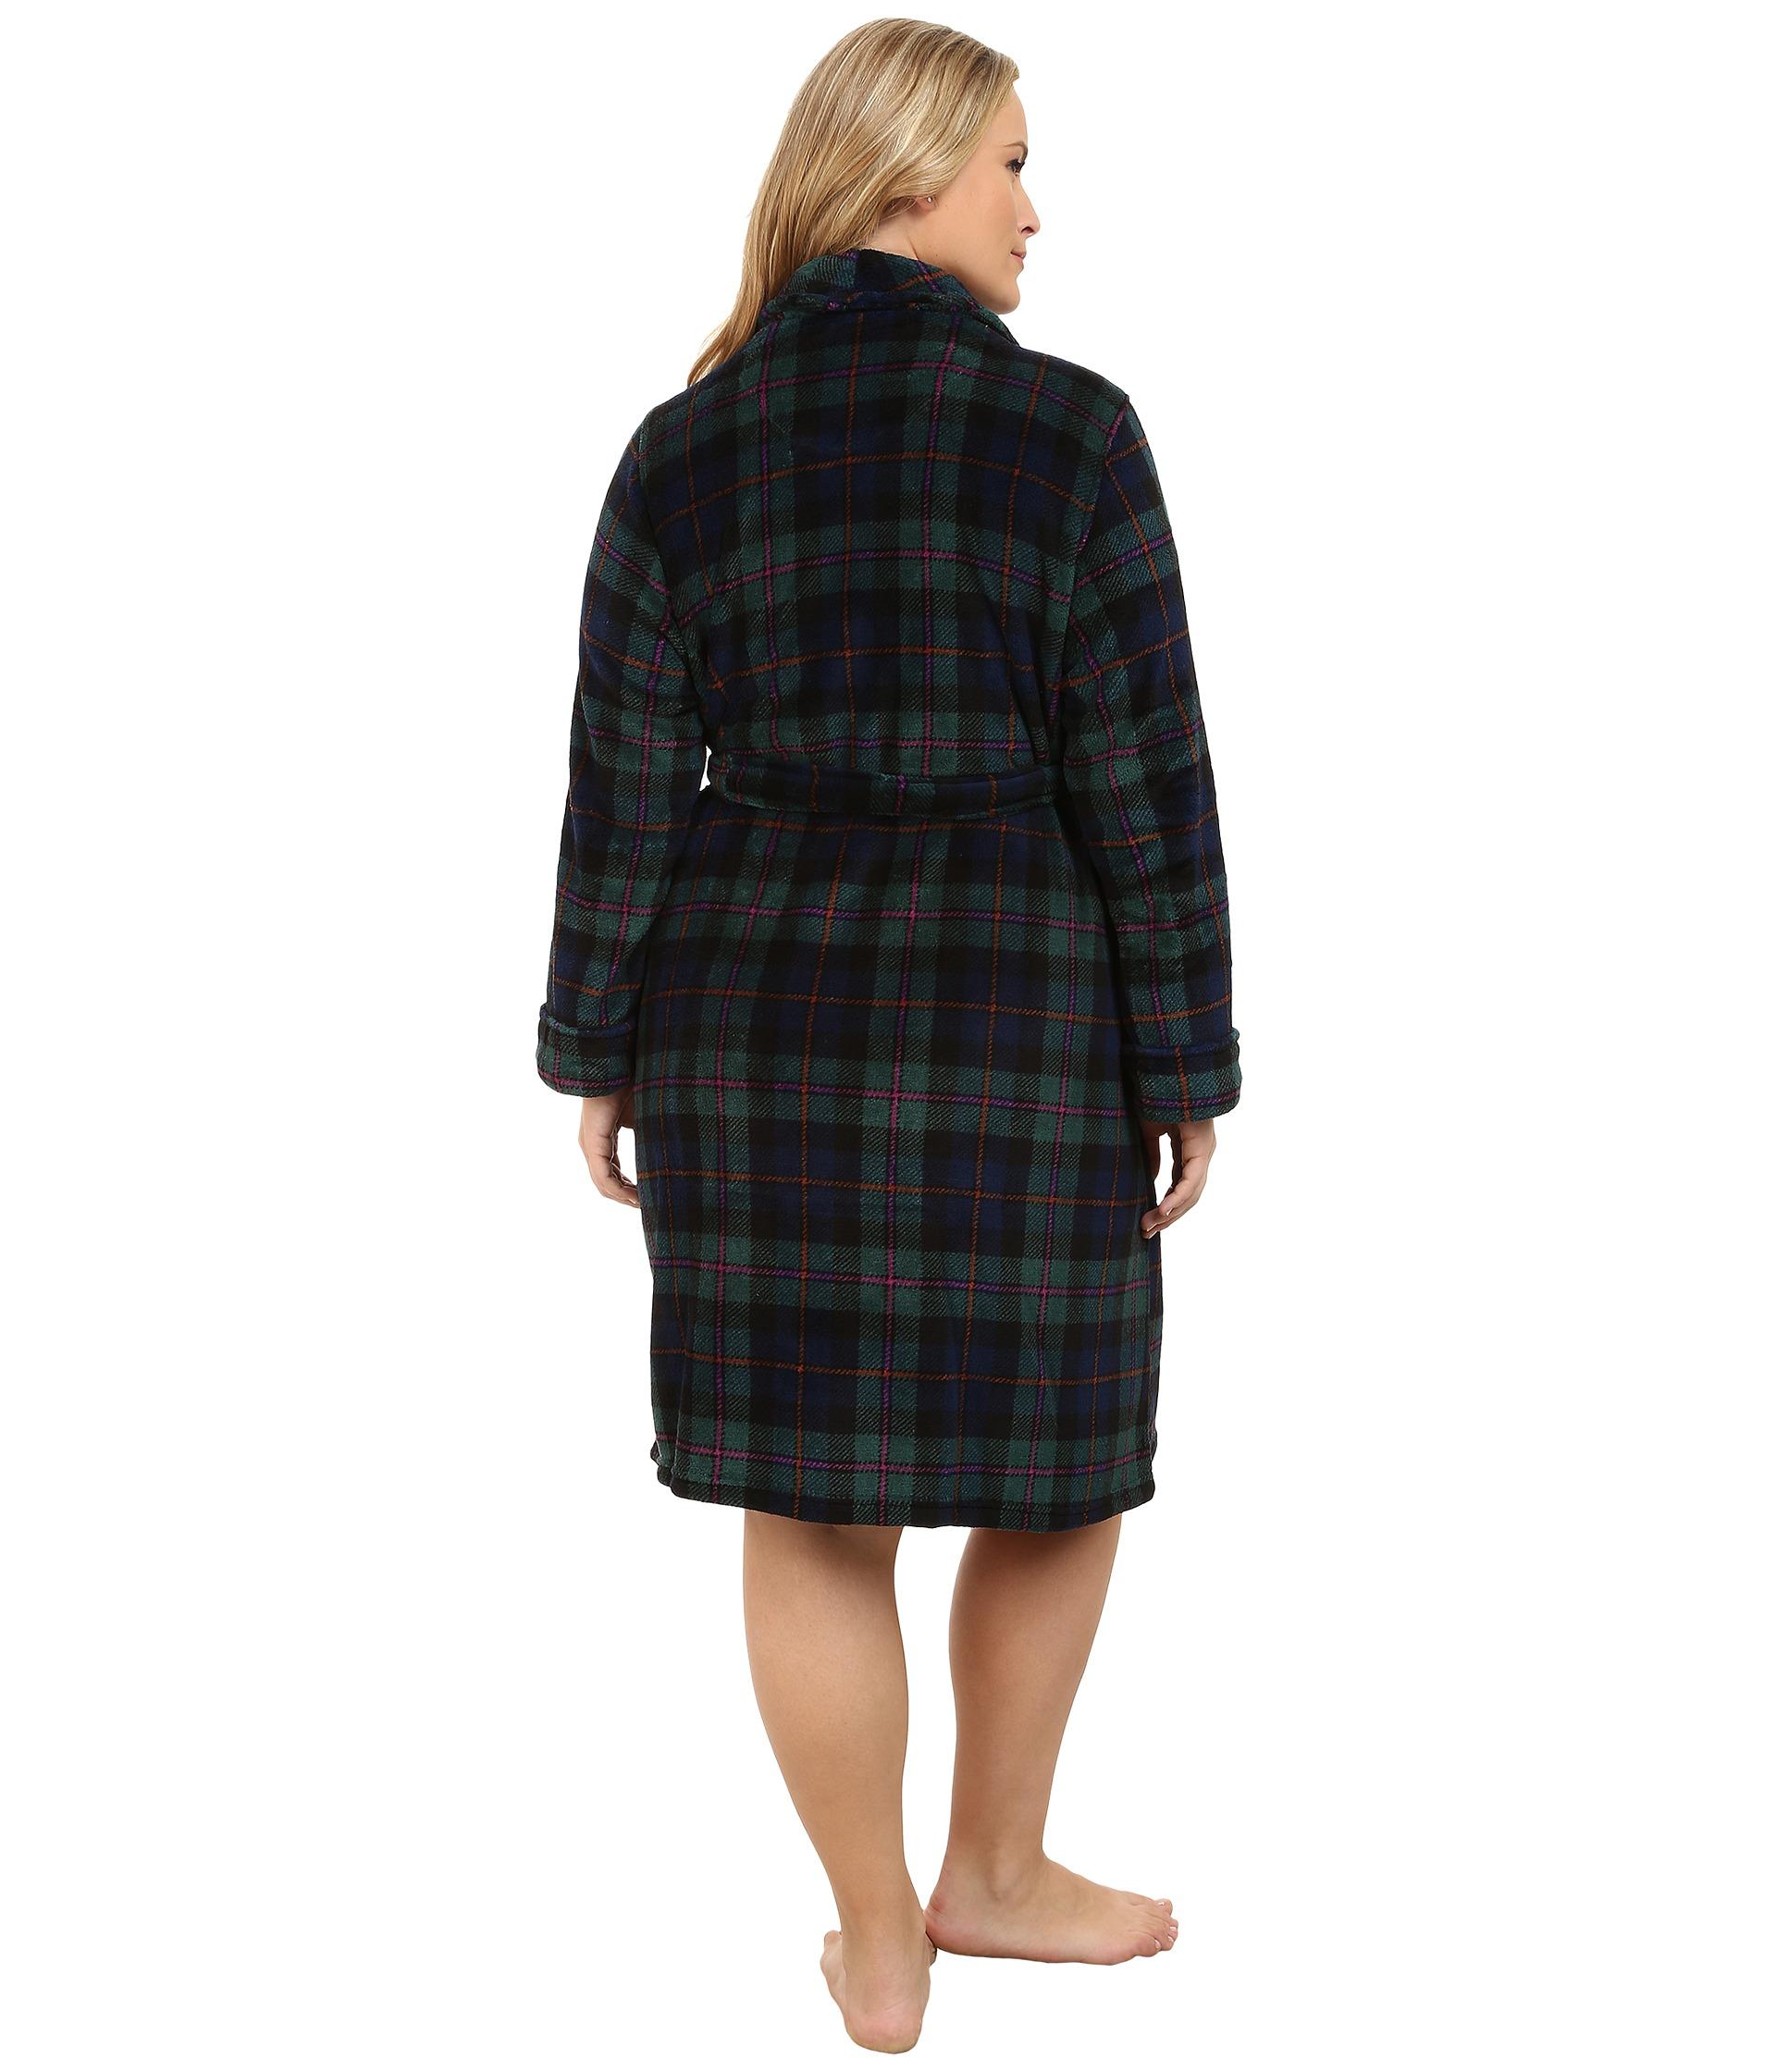 lauren ralph lauren plus size folded so soft terry short robe wallace plaid green windsor navy. Black Bedroom Furniture Sets. Home Design Ideas